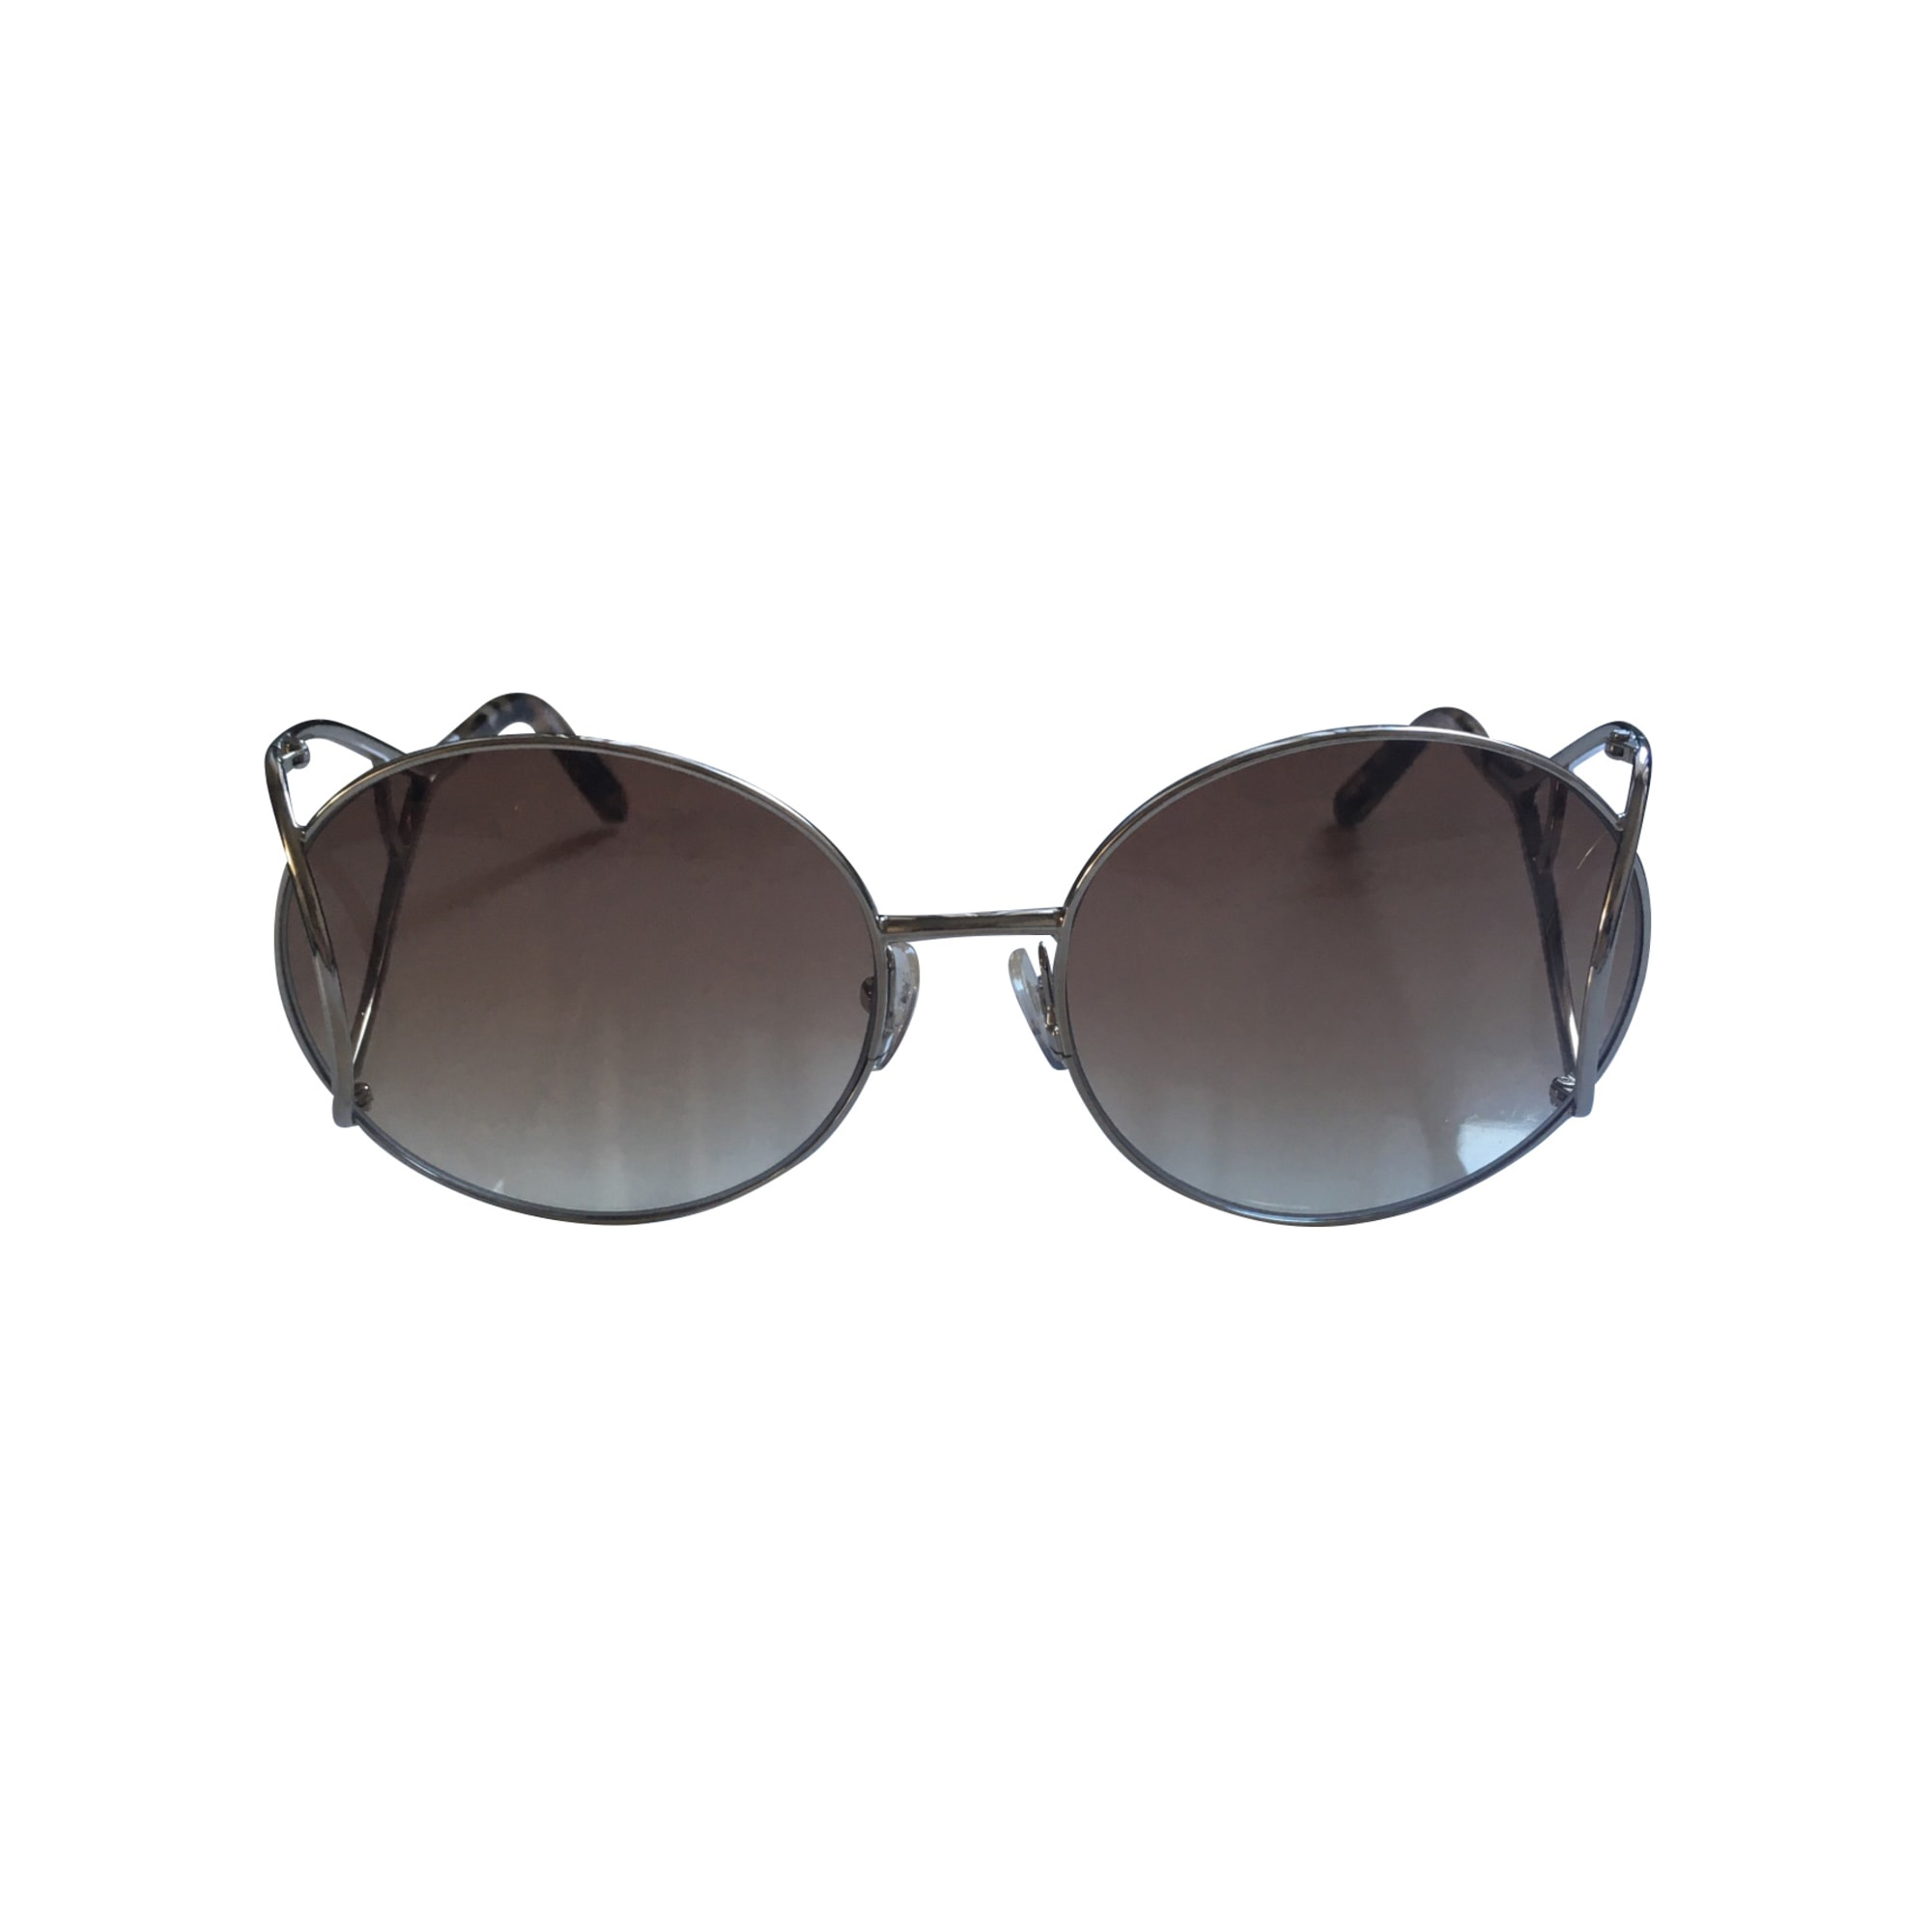 Sunglasses CHLOÉ Golden, bronze, copper